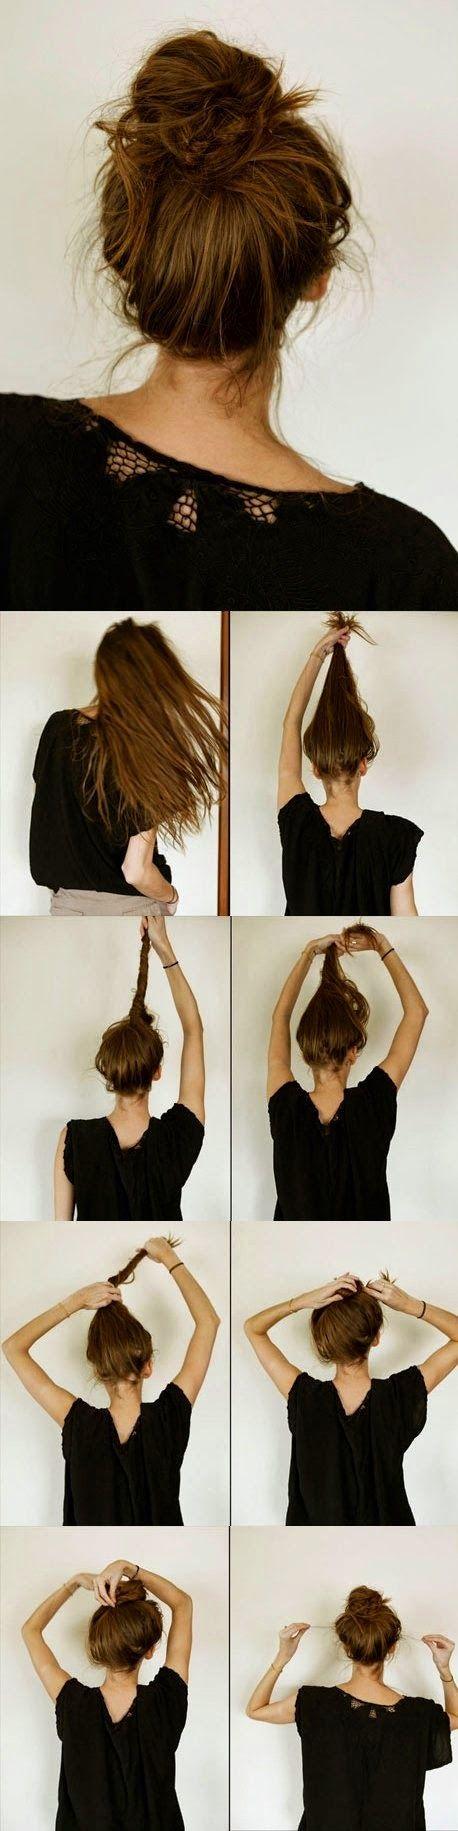 Super easy knotted bun updo diy hair pinterest bun updo